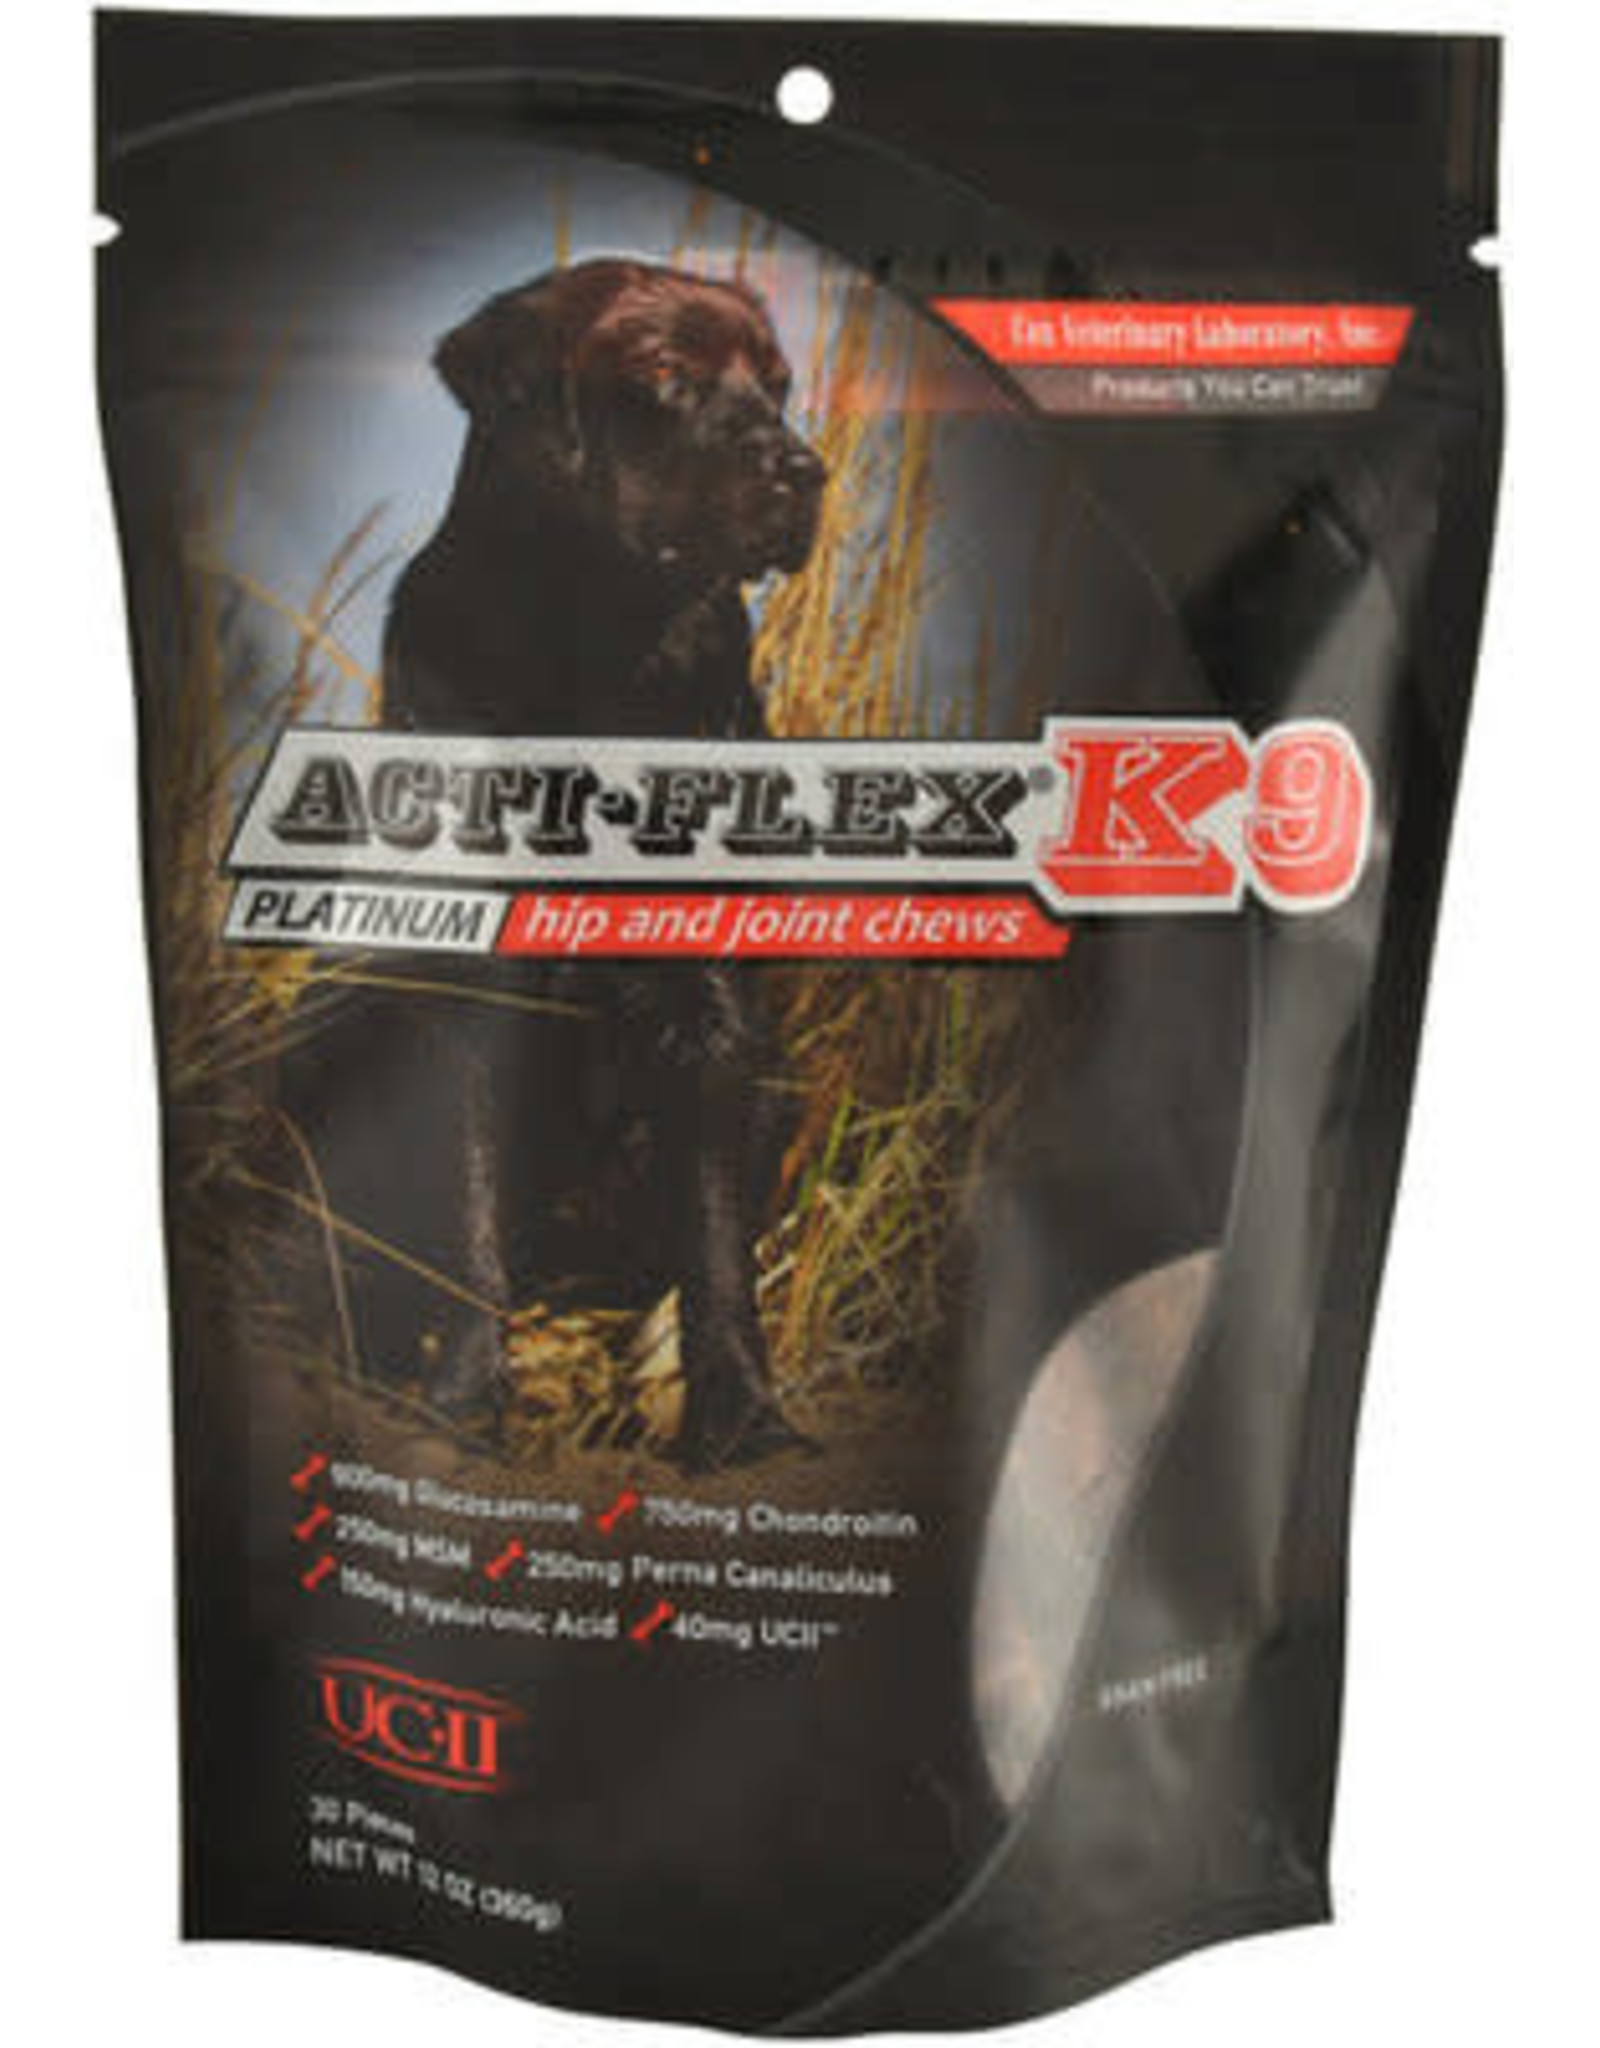 Cox Acti Flex K9 Hip & Joint Chew 30 day